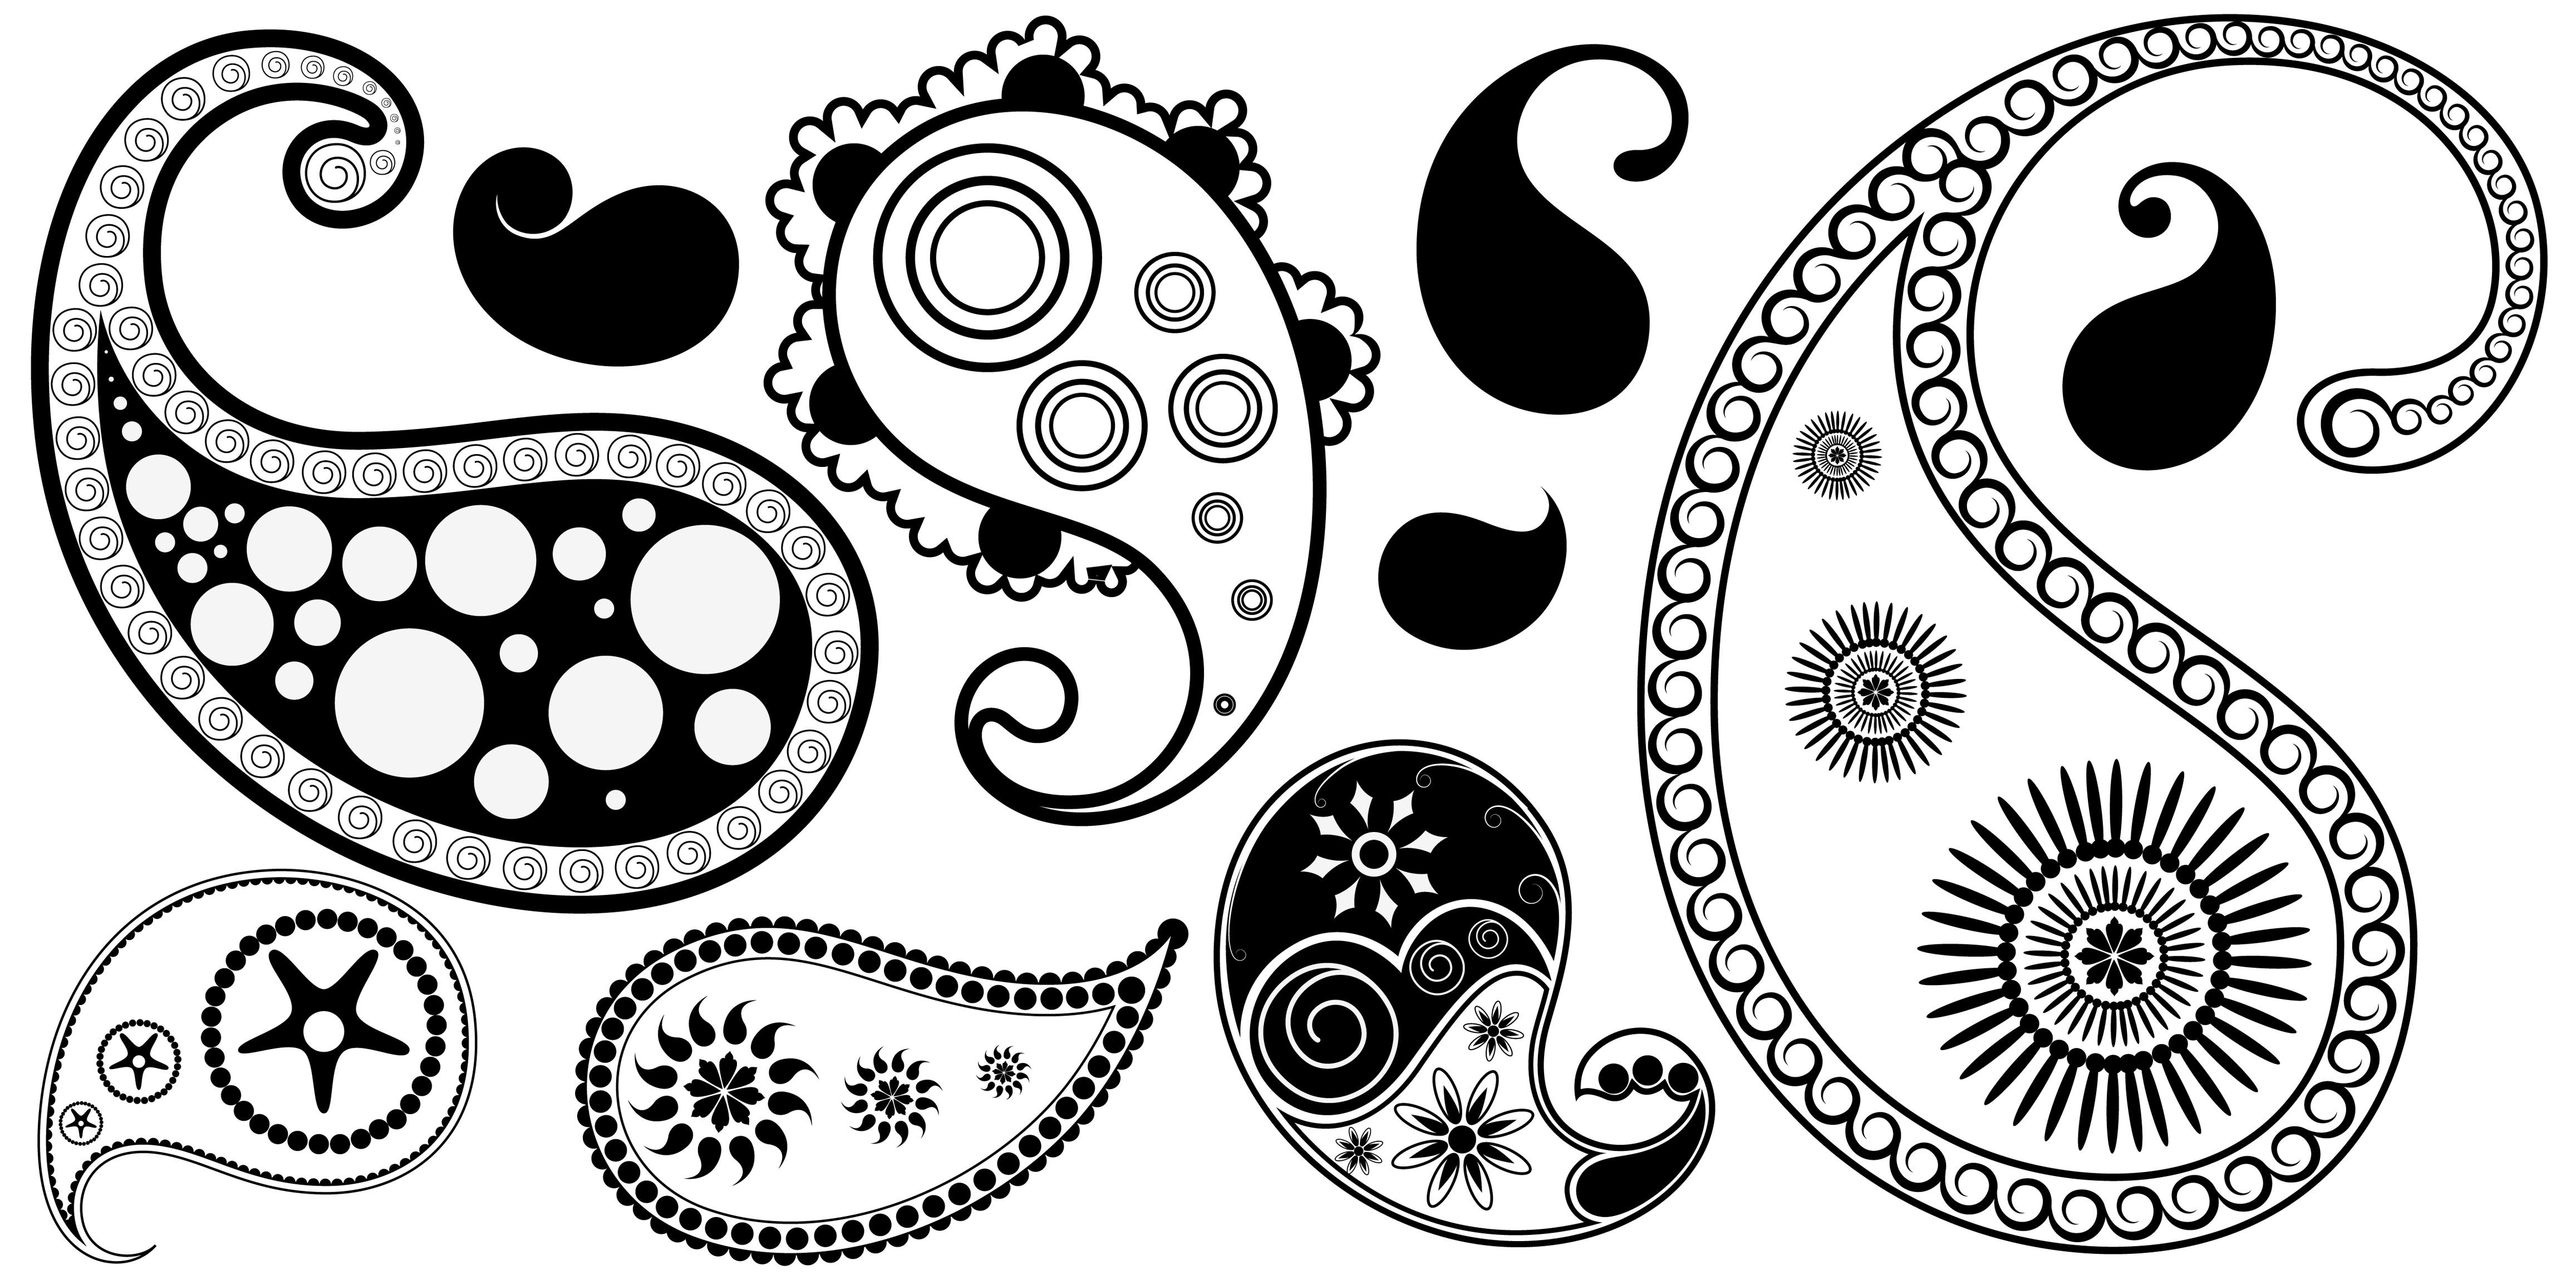 vector clip art patterns - photo #34